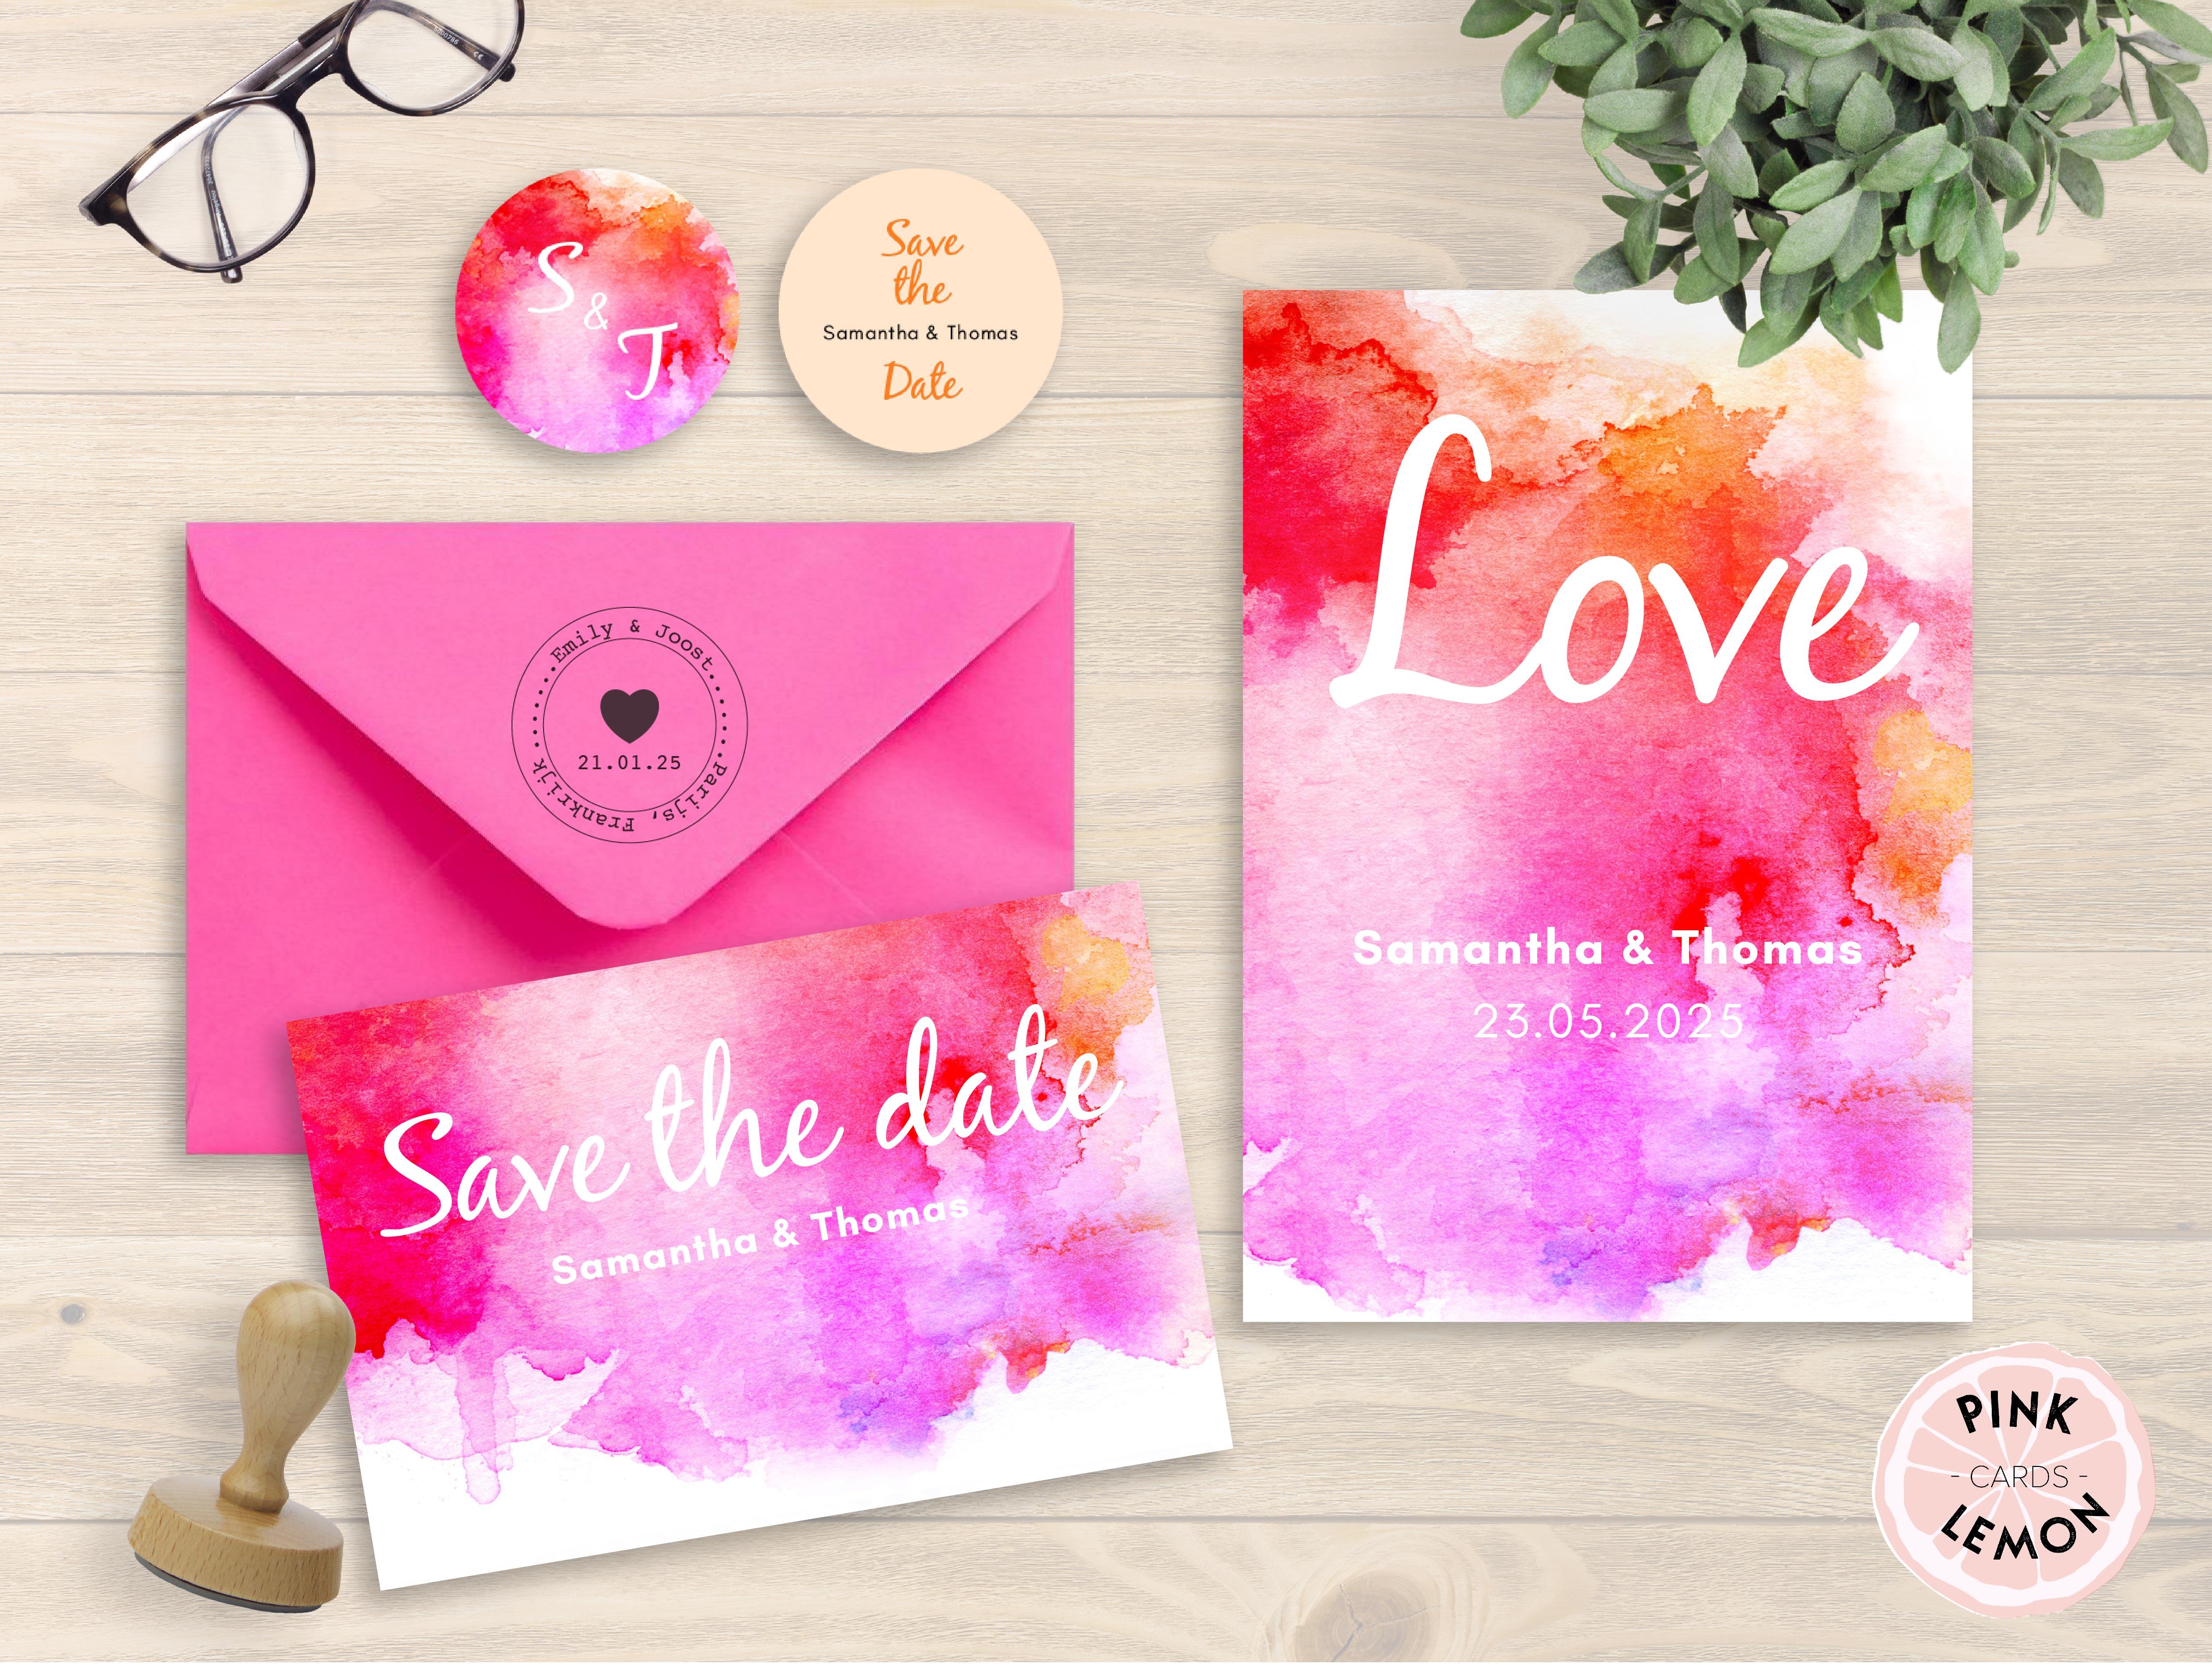 Pink Lemon Cards